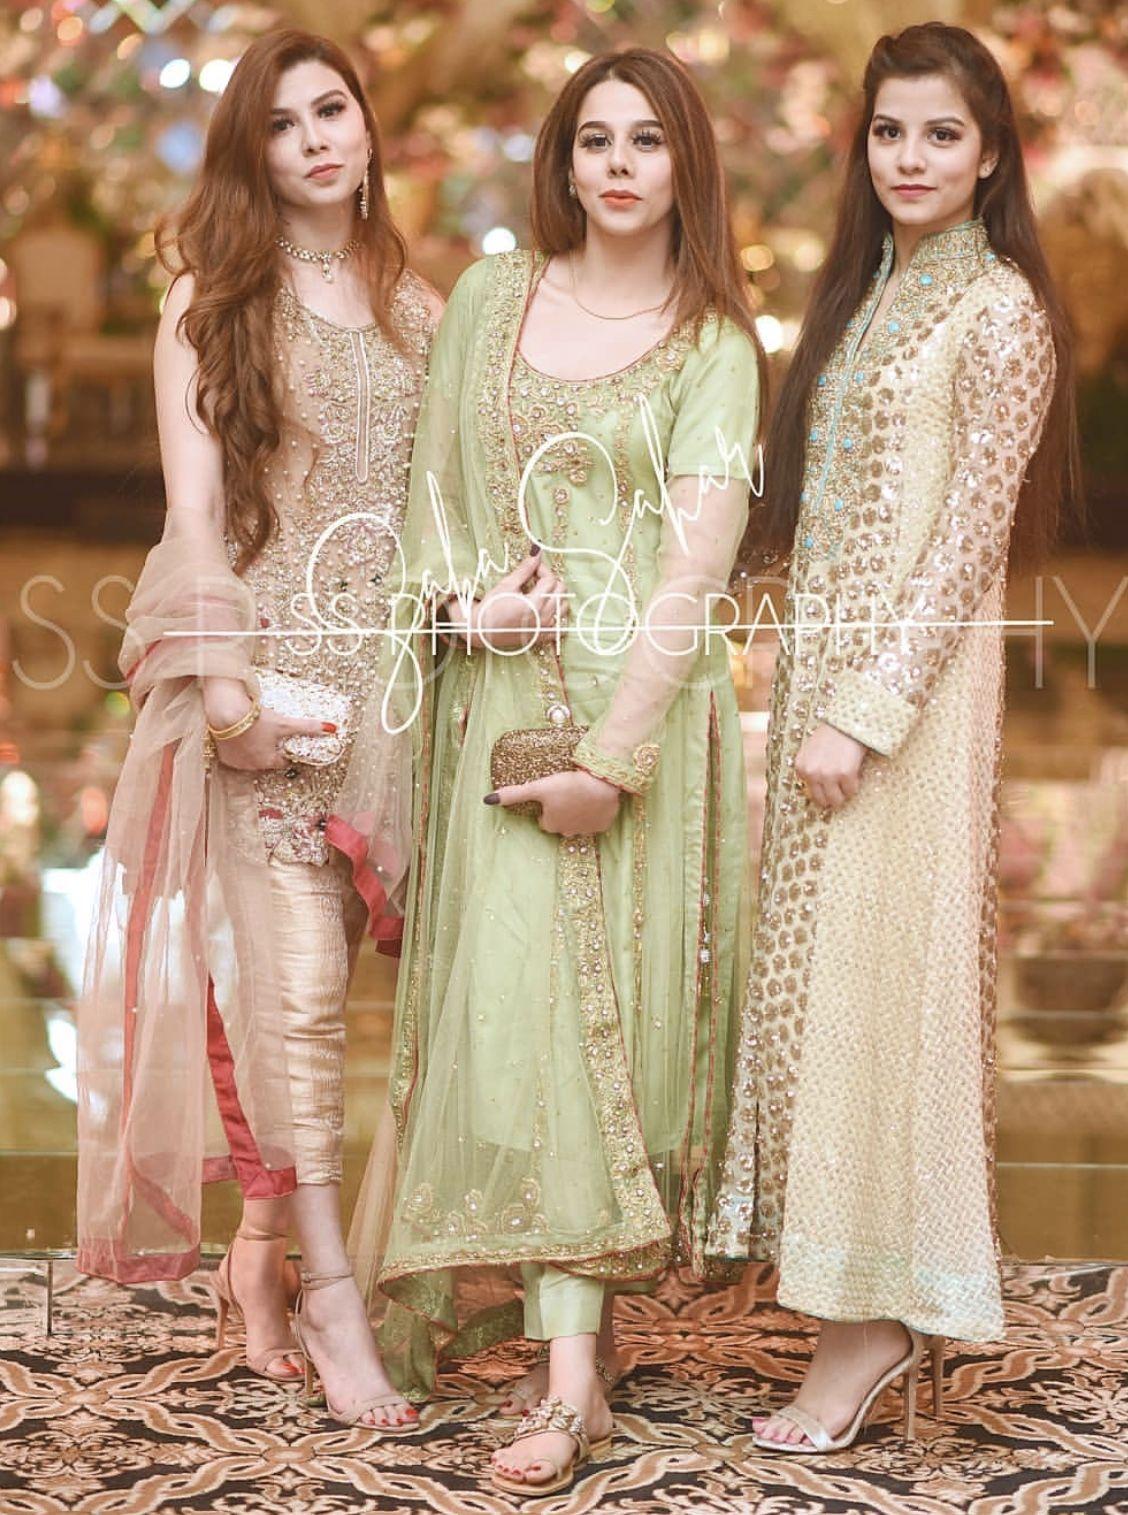 Brides side Mehndi dresses